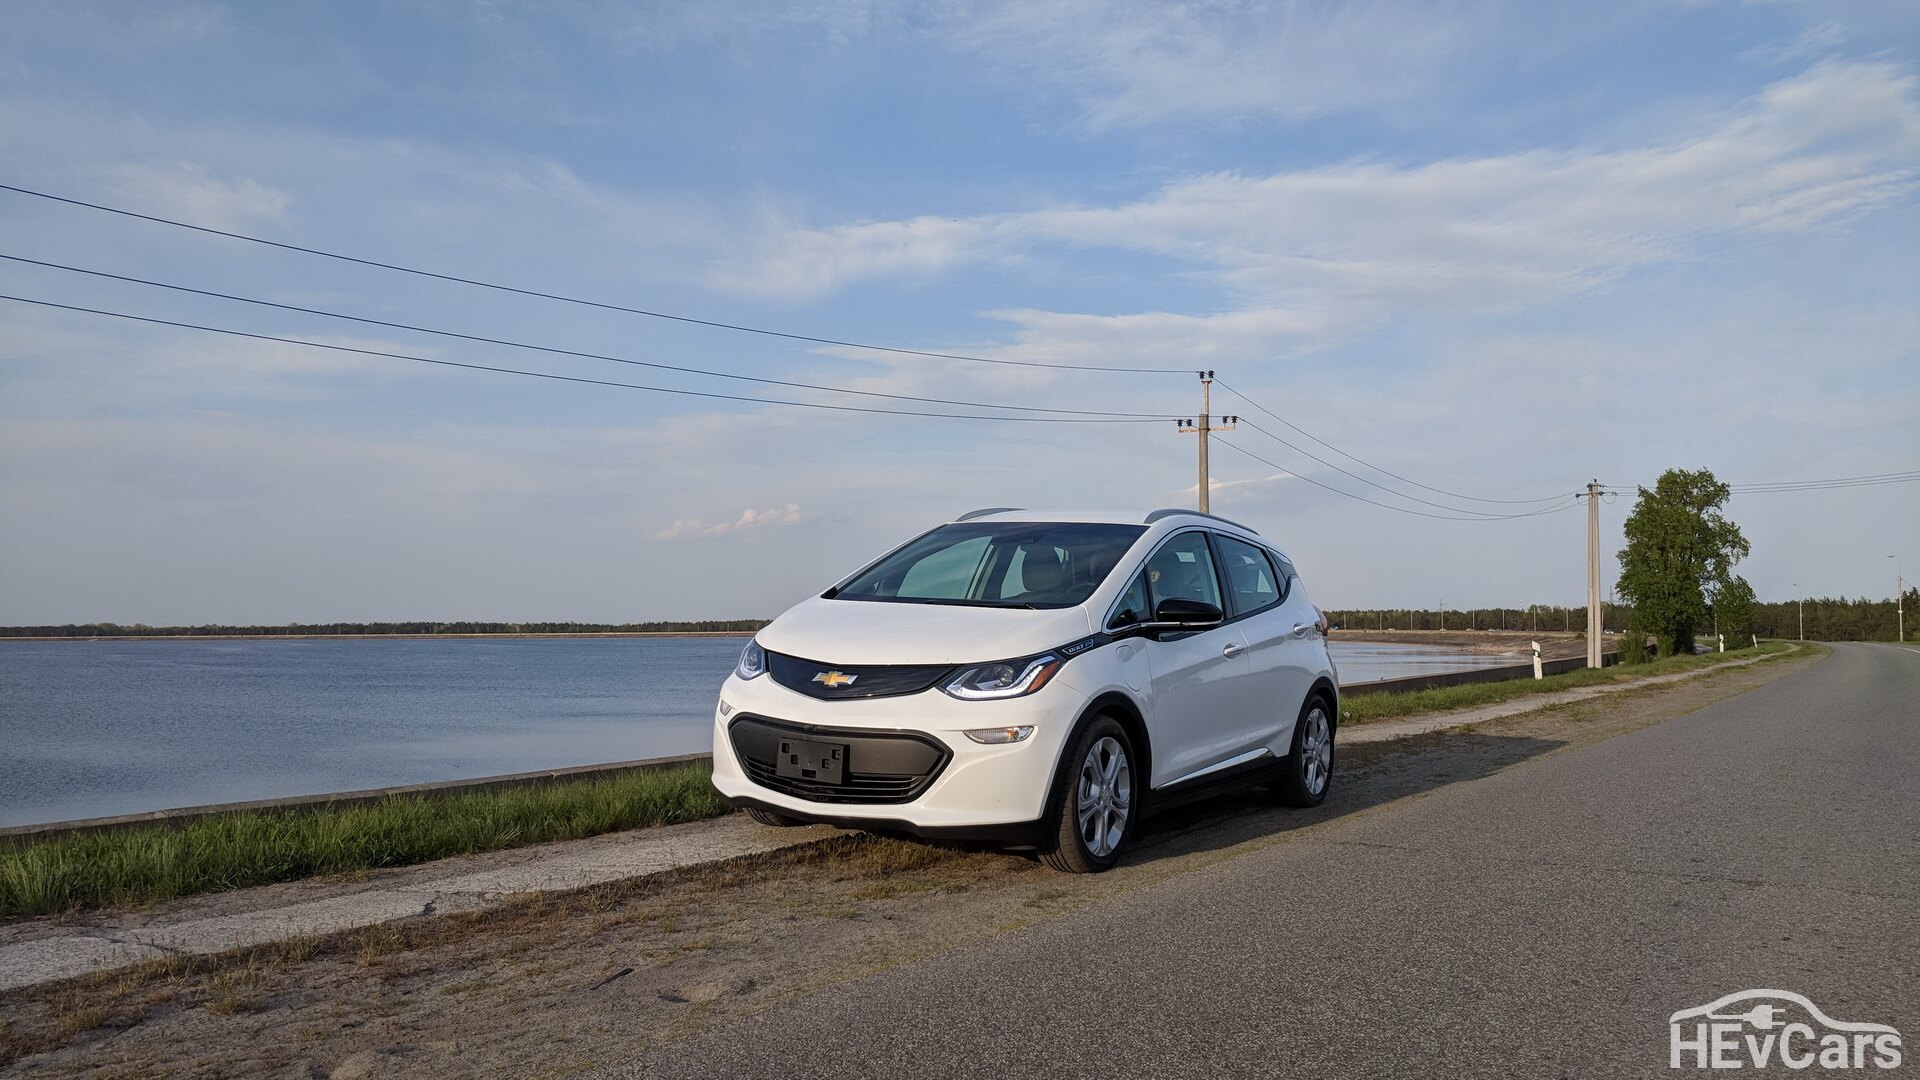 Chevrolet Bolt возле Киевской ГЭС